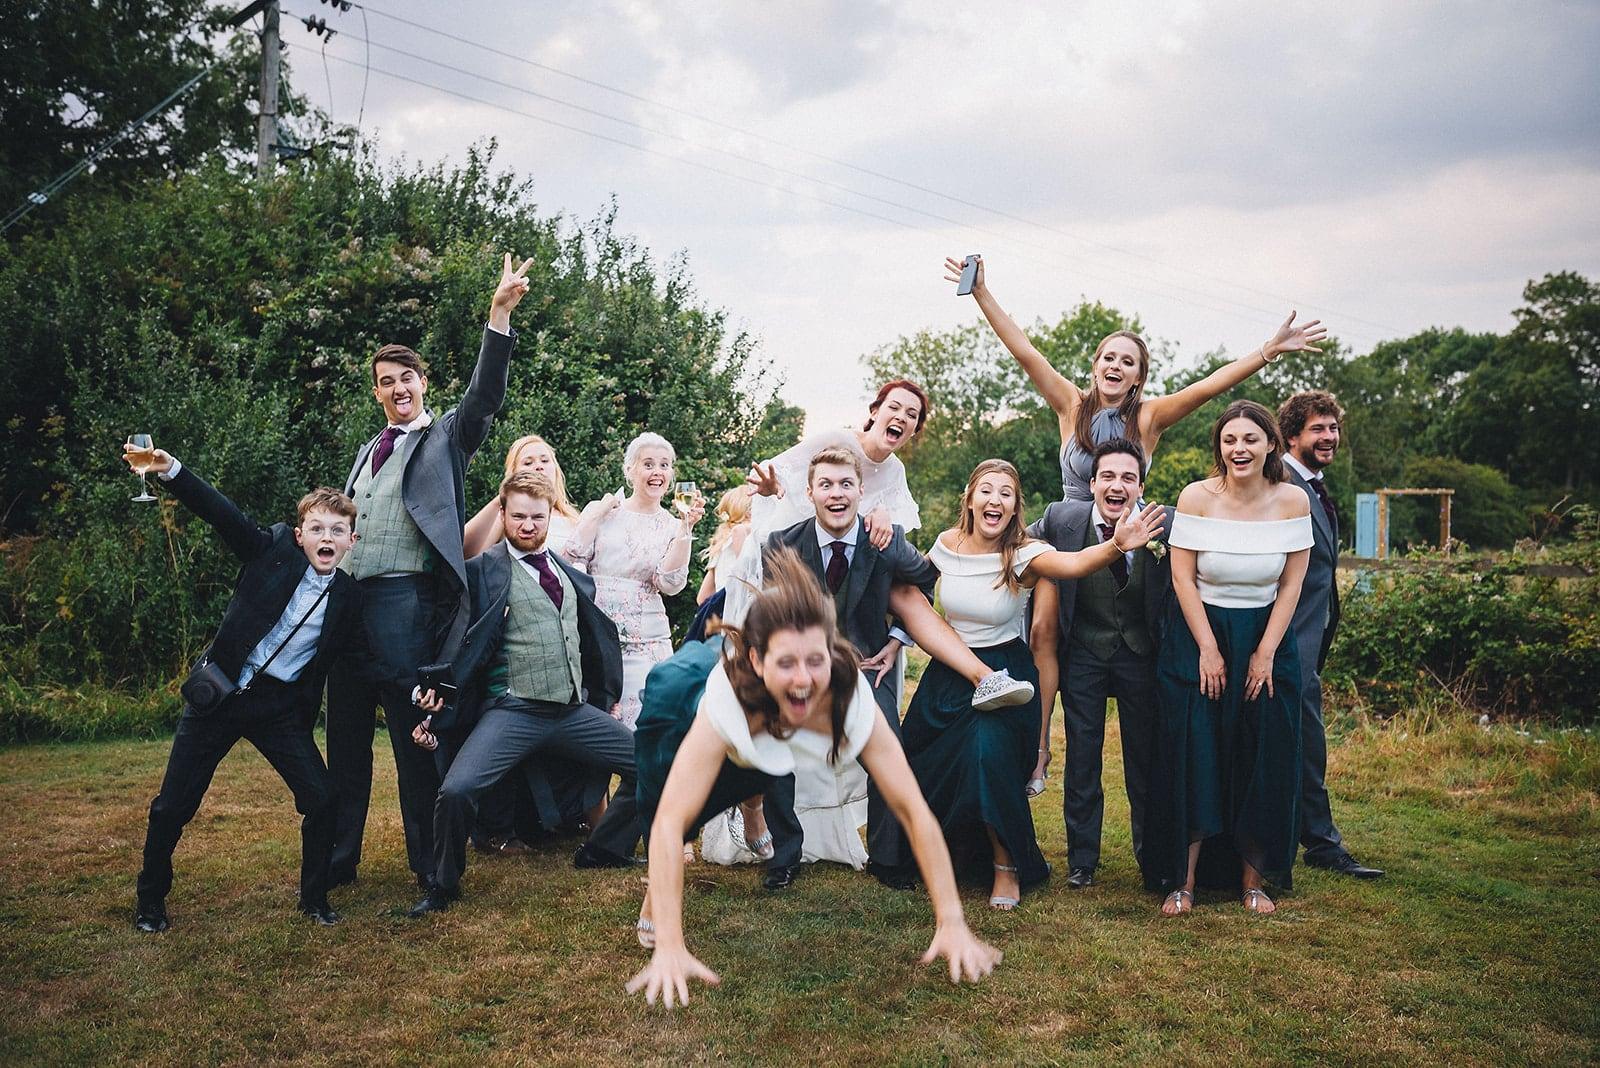 unposed natural fun group shot at a joyful cambridge farm marquee wedding